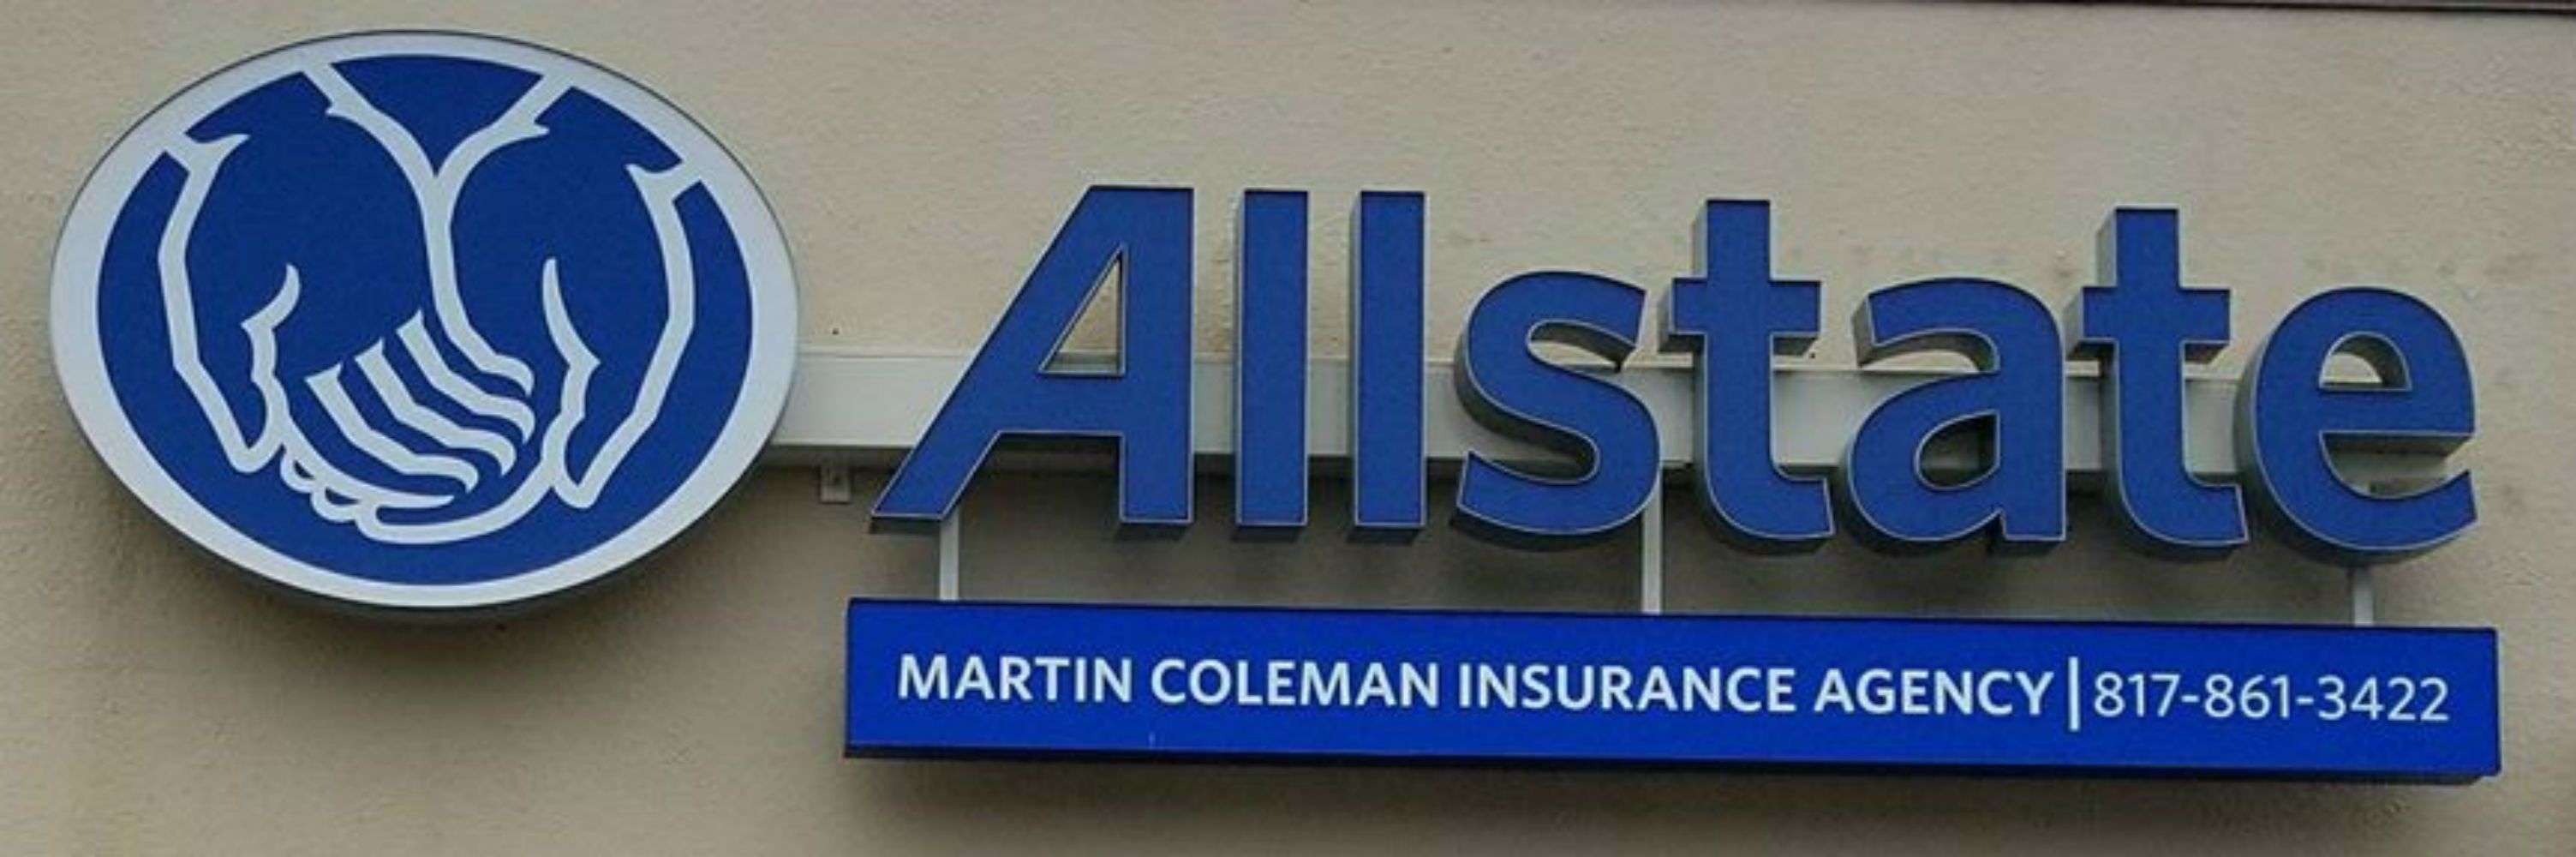 Martin Coleman: Allstate Insurance image 1